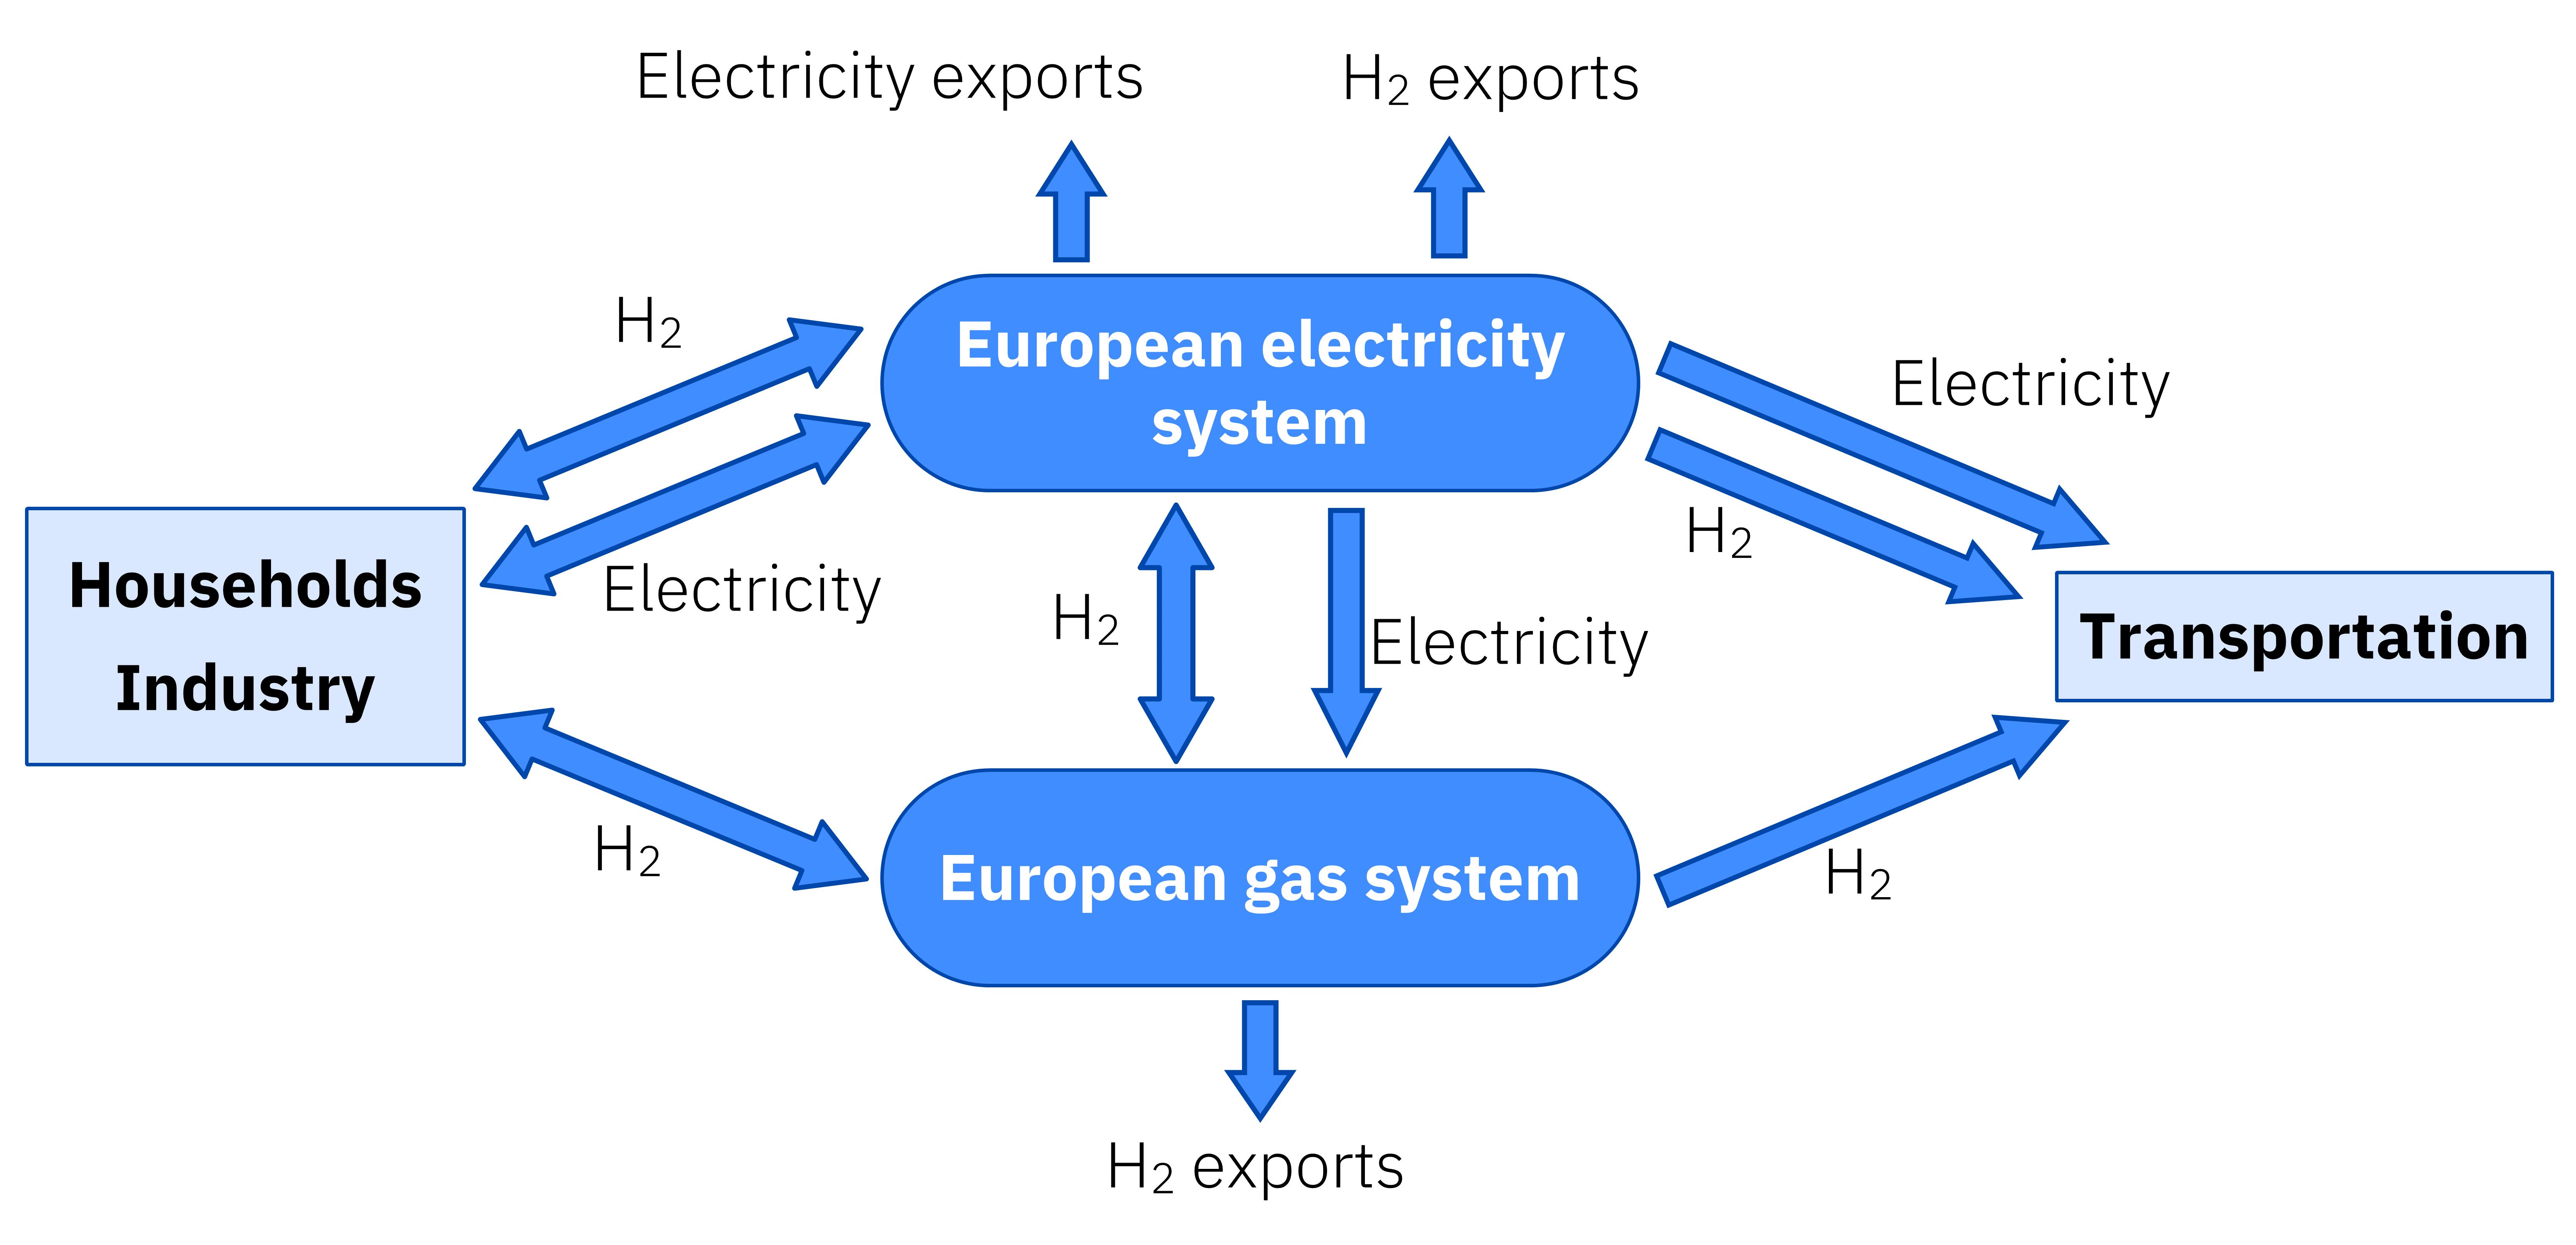 AleaSoft - Energy system Europe 2050